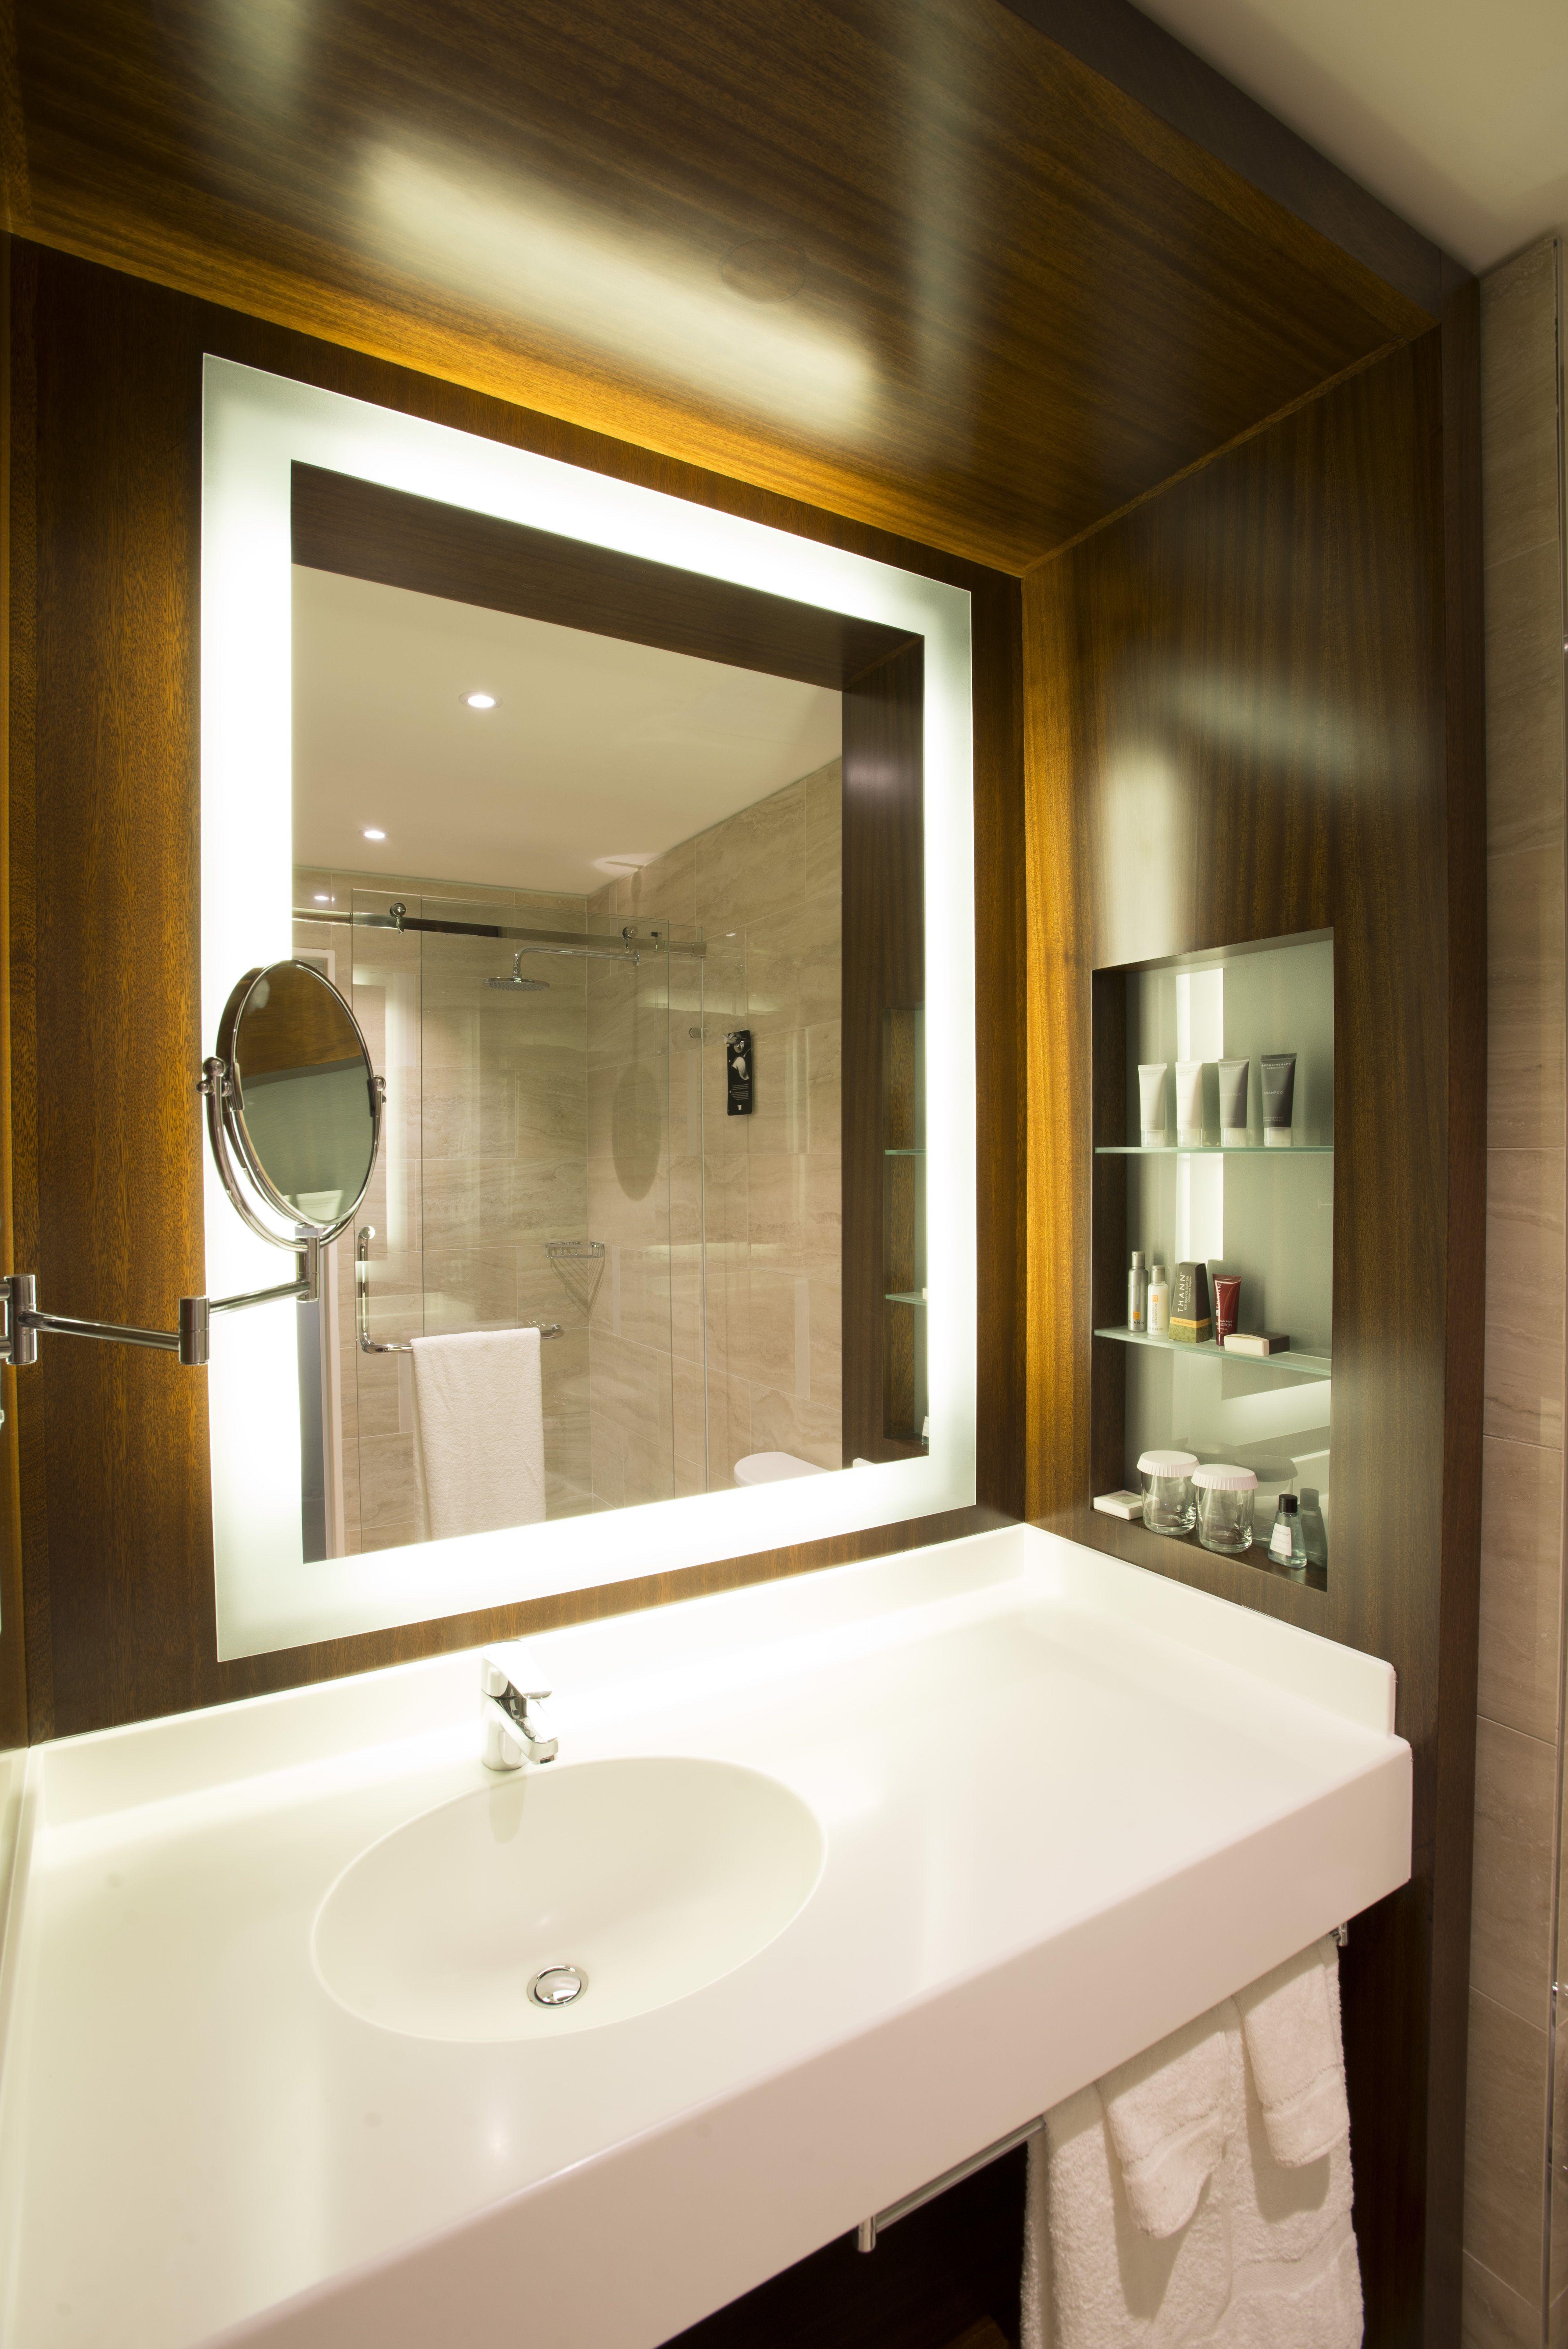 Marriott Hotel - SANTA CRUZ, BOLIVIA - hotel interior ...